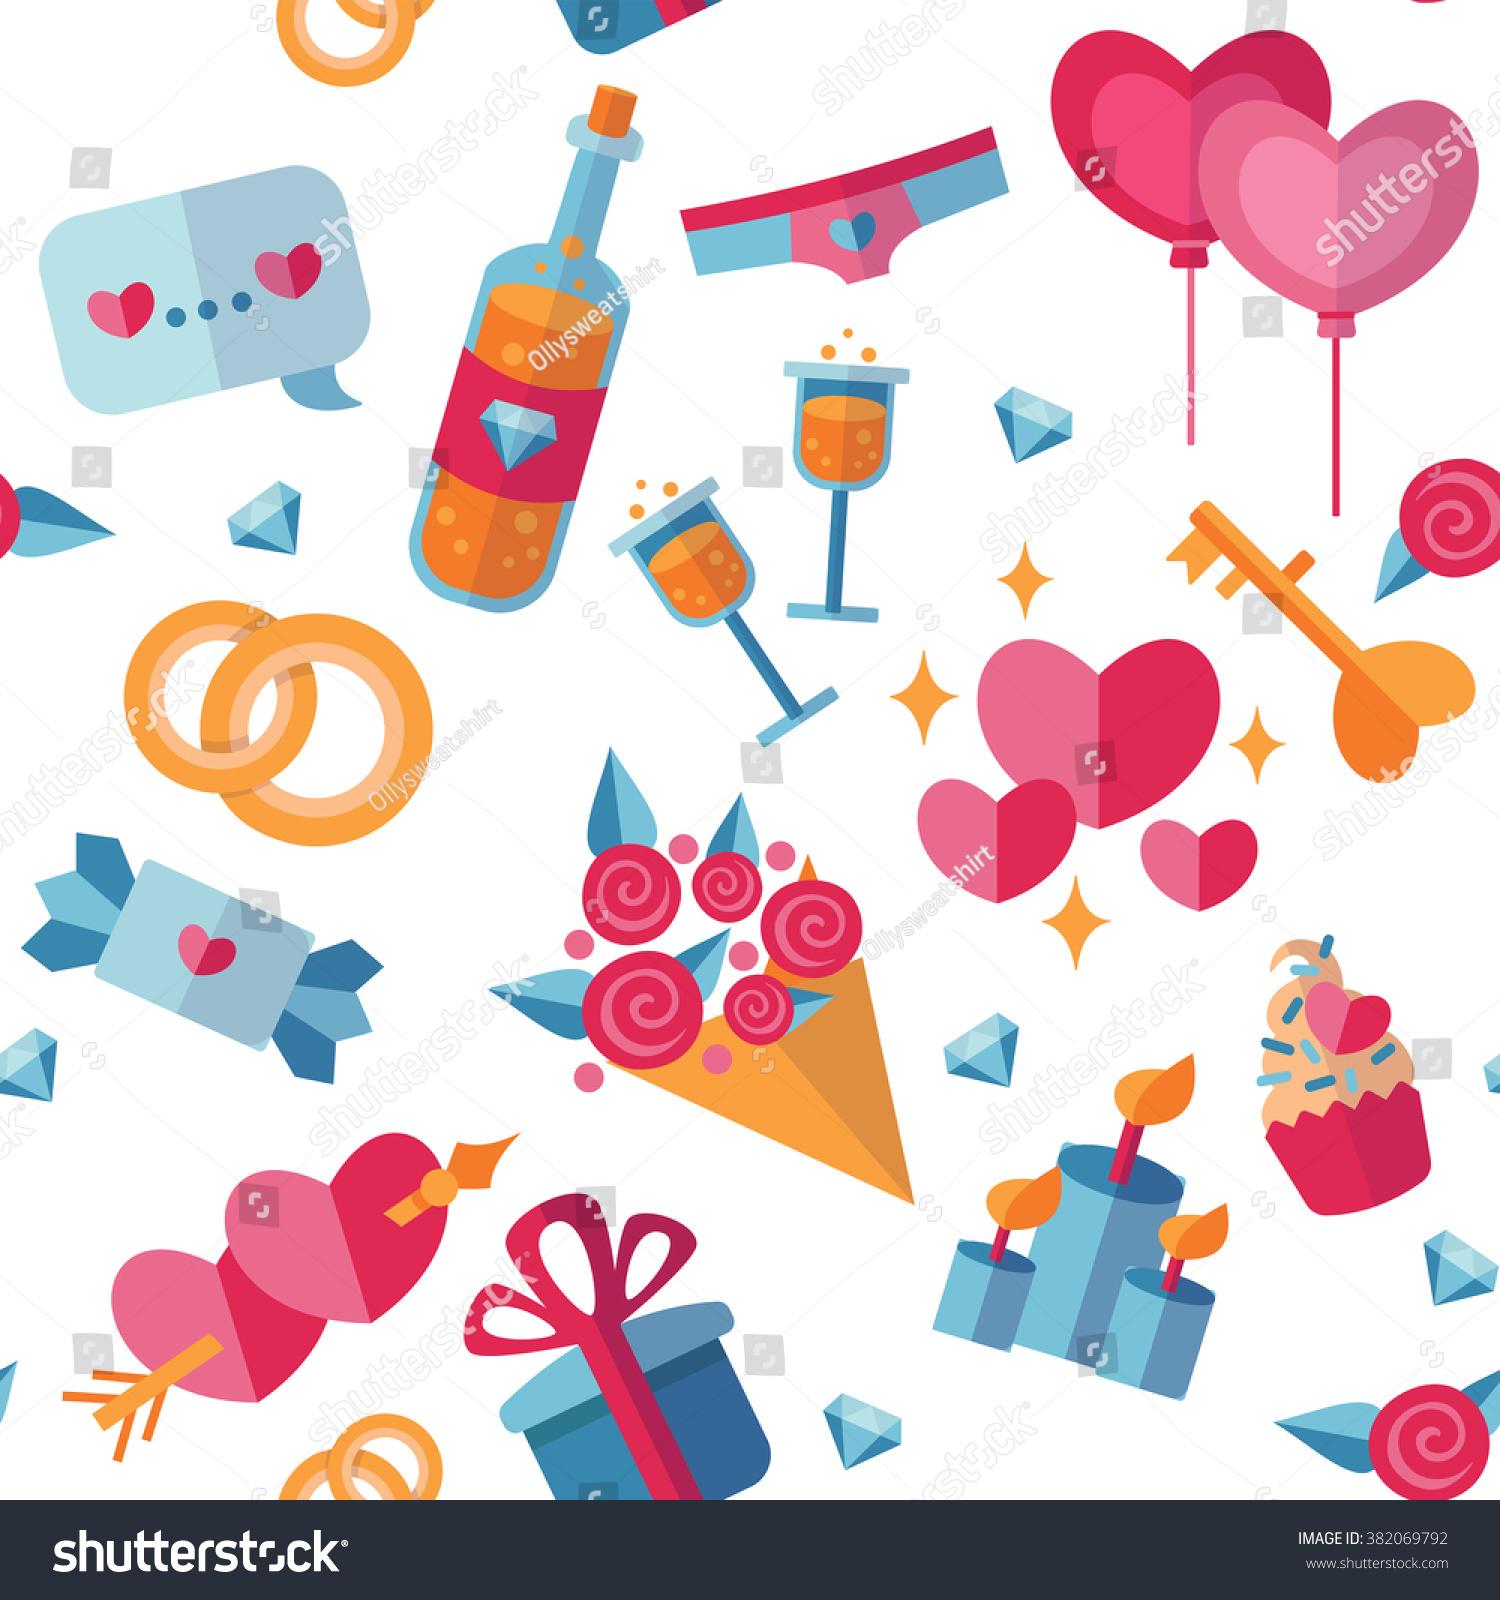 Wedding Romantic Relationships Flat Objects Seamless Stock ...